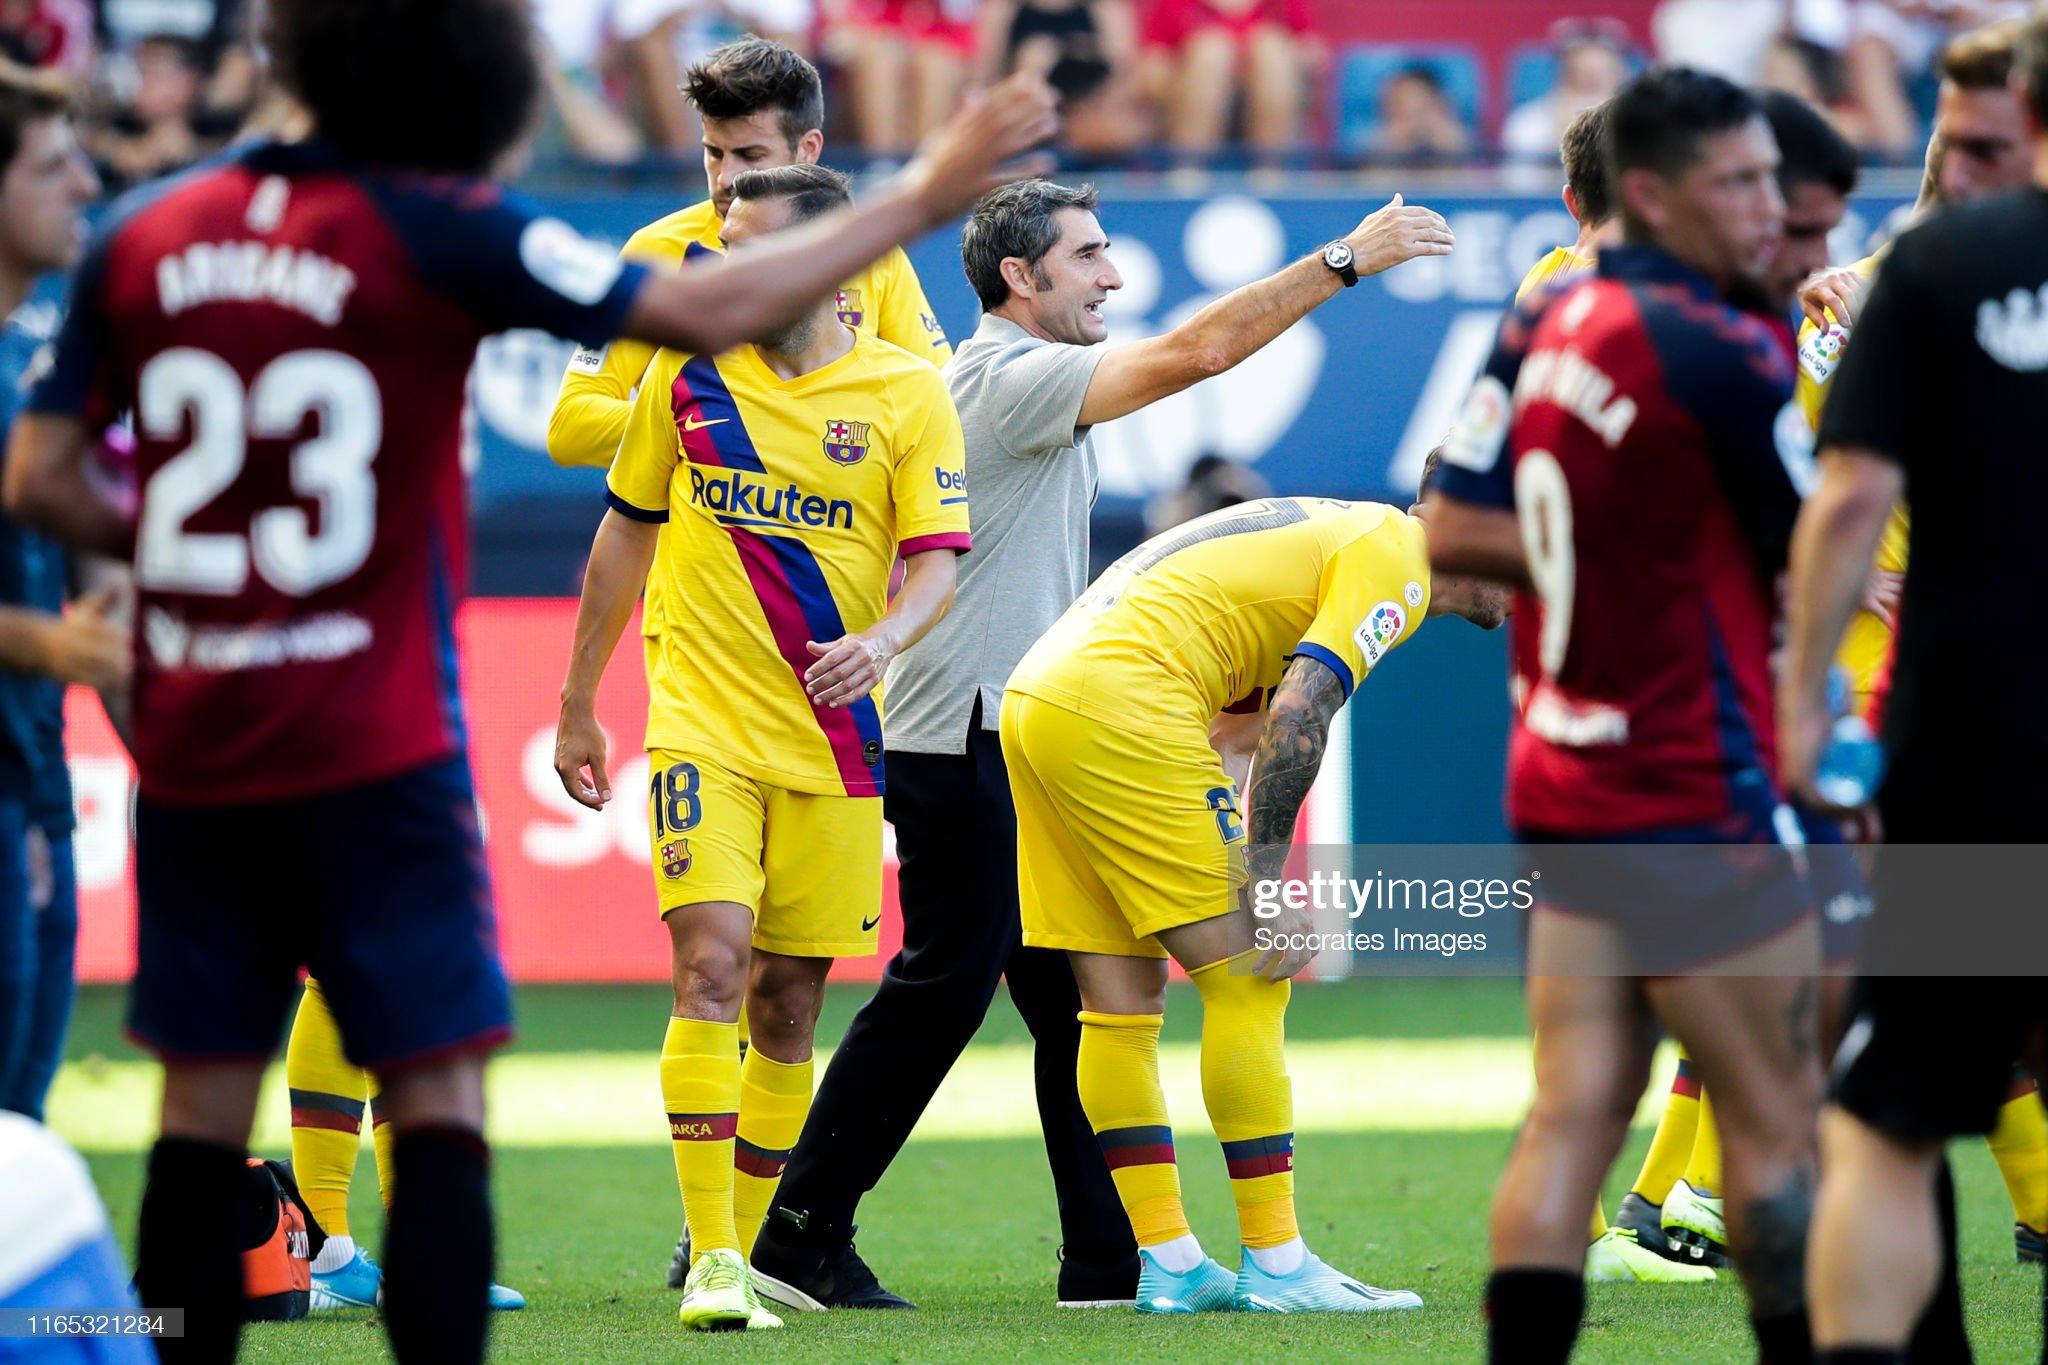 صور مباراة : أوساسونا - برشلونة 2-2 ( 31-08-2019 )  Coach-ernesto-valverde-of-fc-barcelona-during-the-la-liga-santander-picture-id1165321284?s=2048x2048